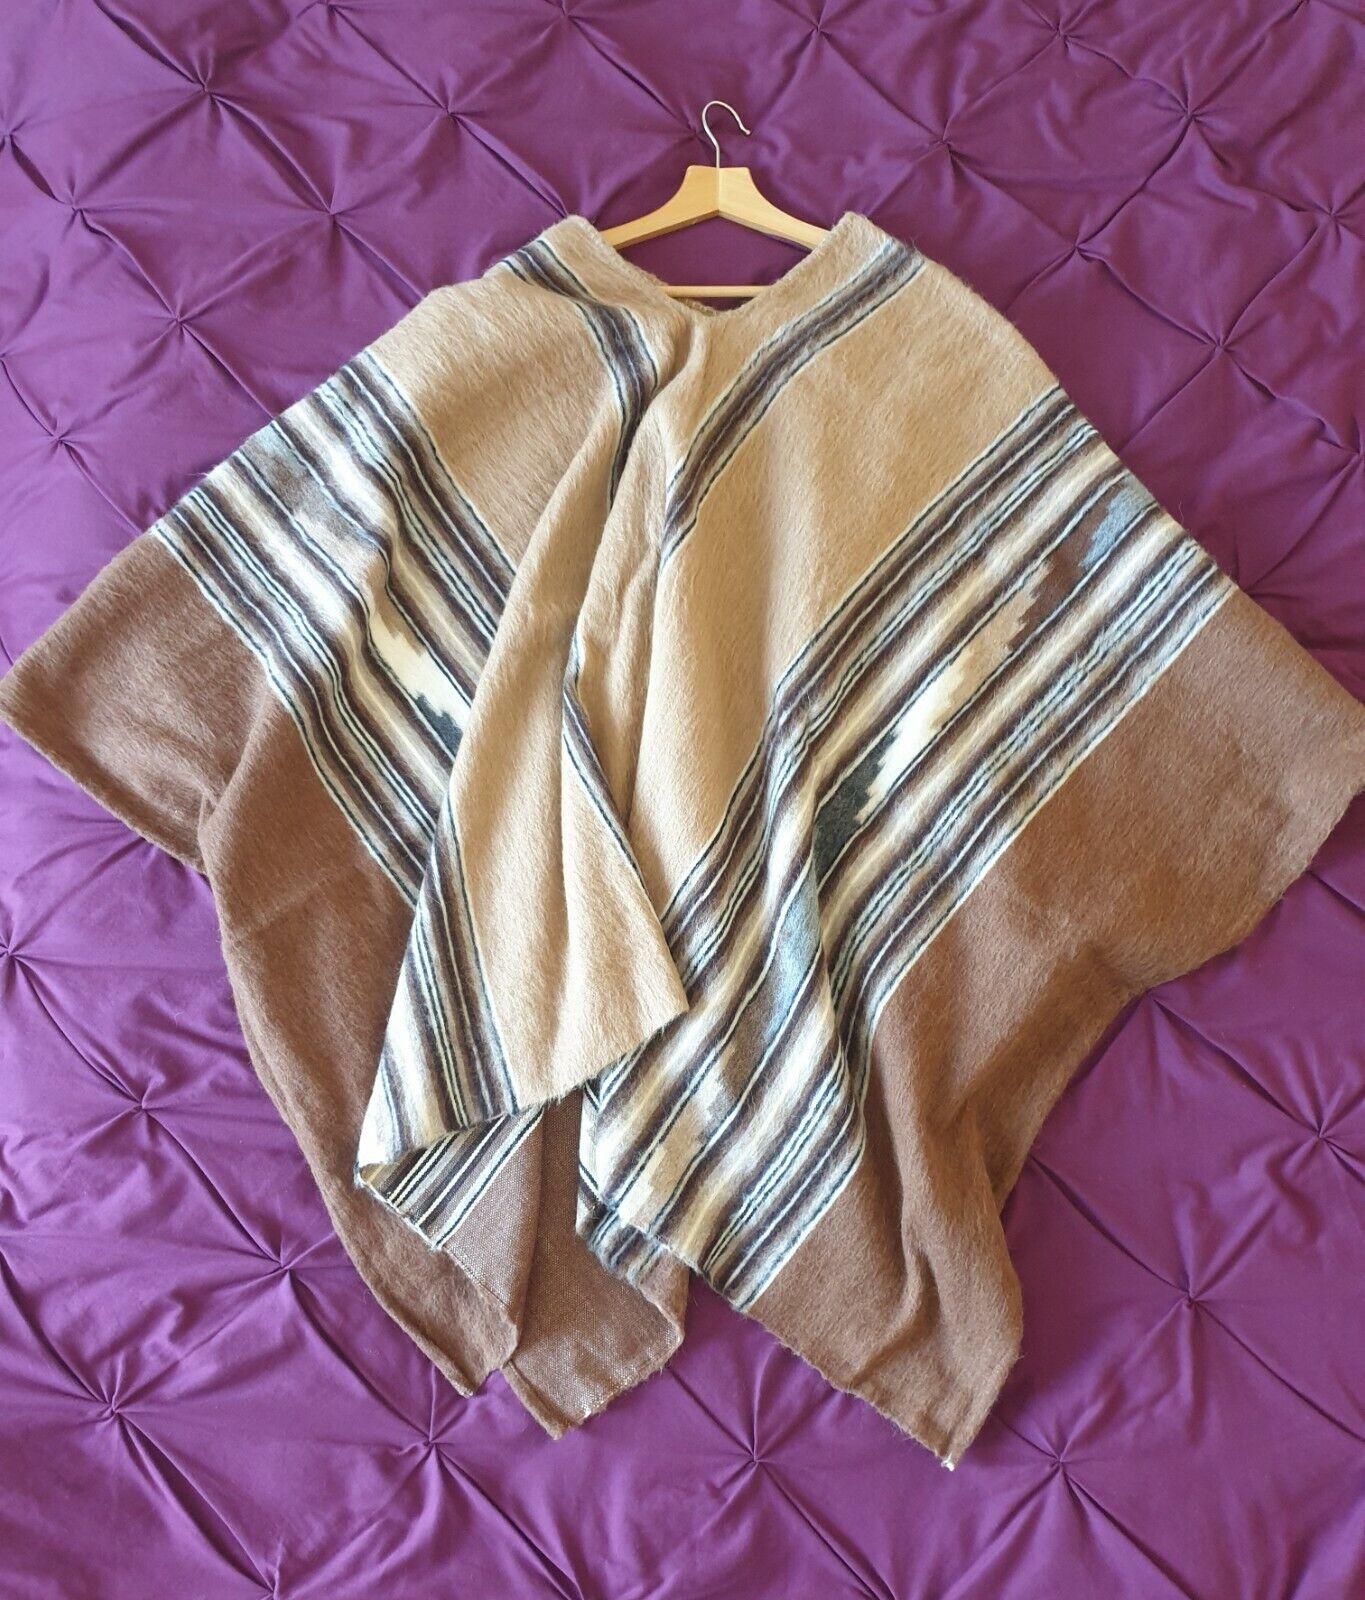 Genuine handmade traditional Peruvian alpaca wool poncho